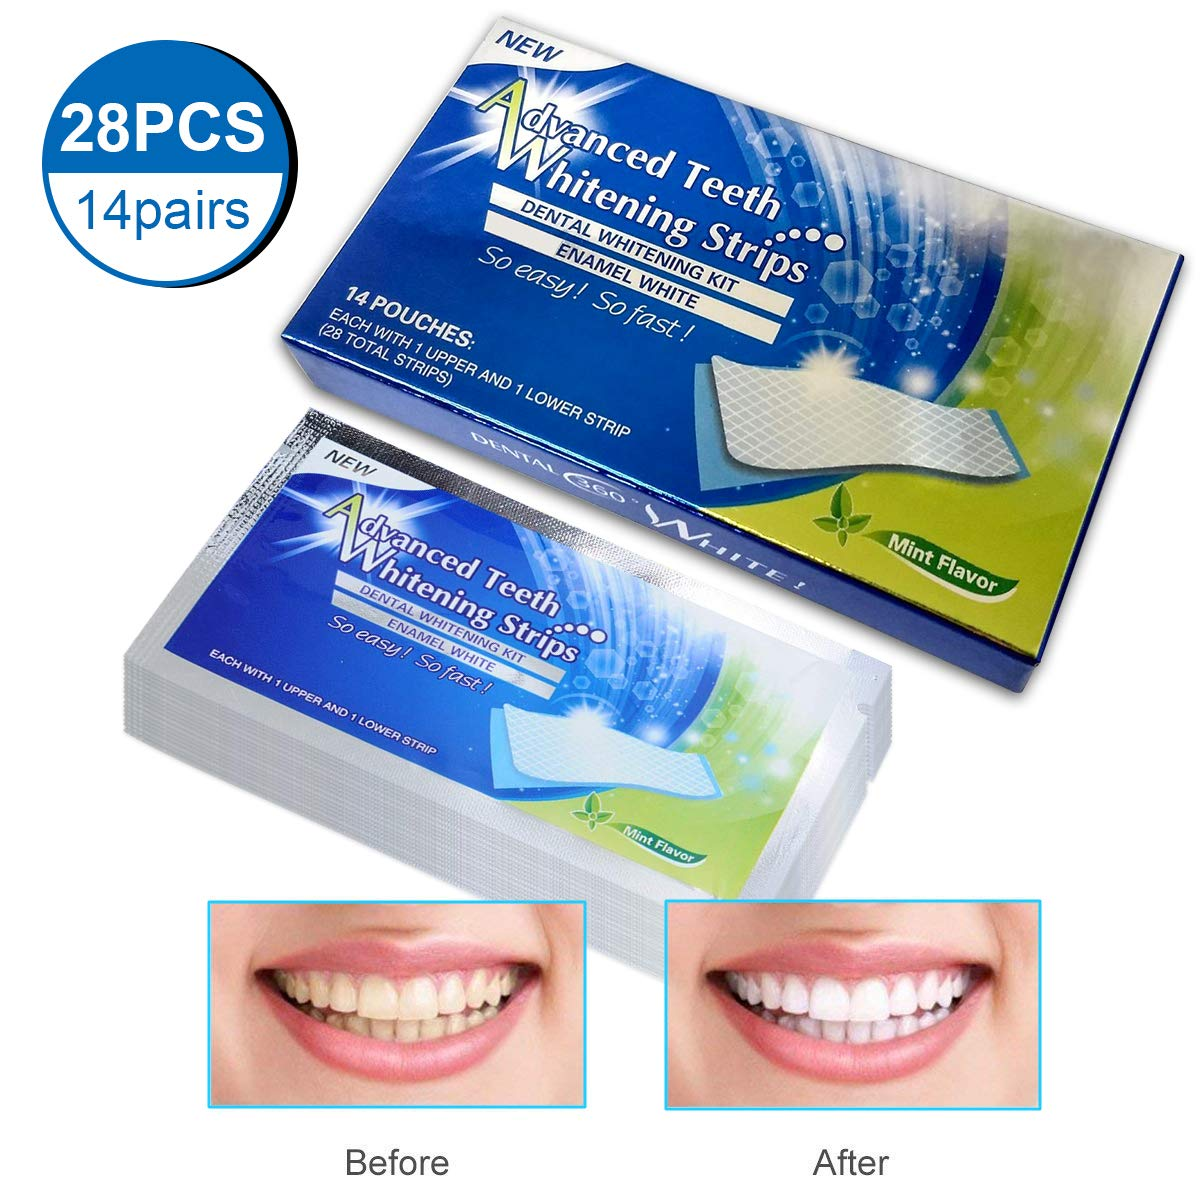 Teeth Whitening Strip, Dental Care Kits, iFanze Elastic Advanced Tooth Whitening Gel Whitestrips Bleaching System Cleaning Teeth 14 x 2pcs